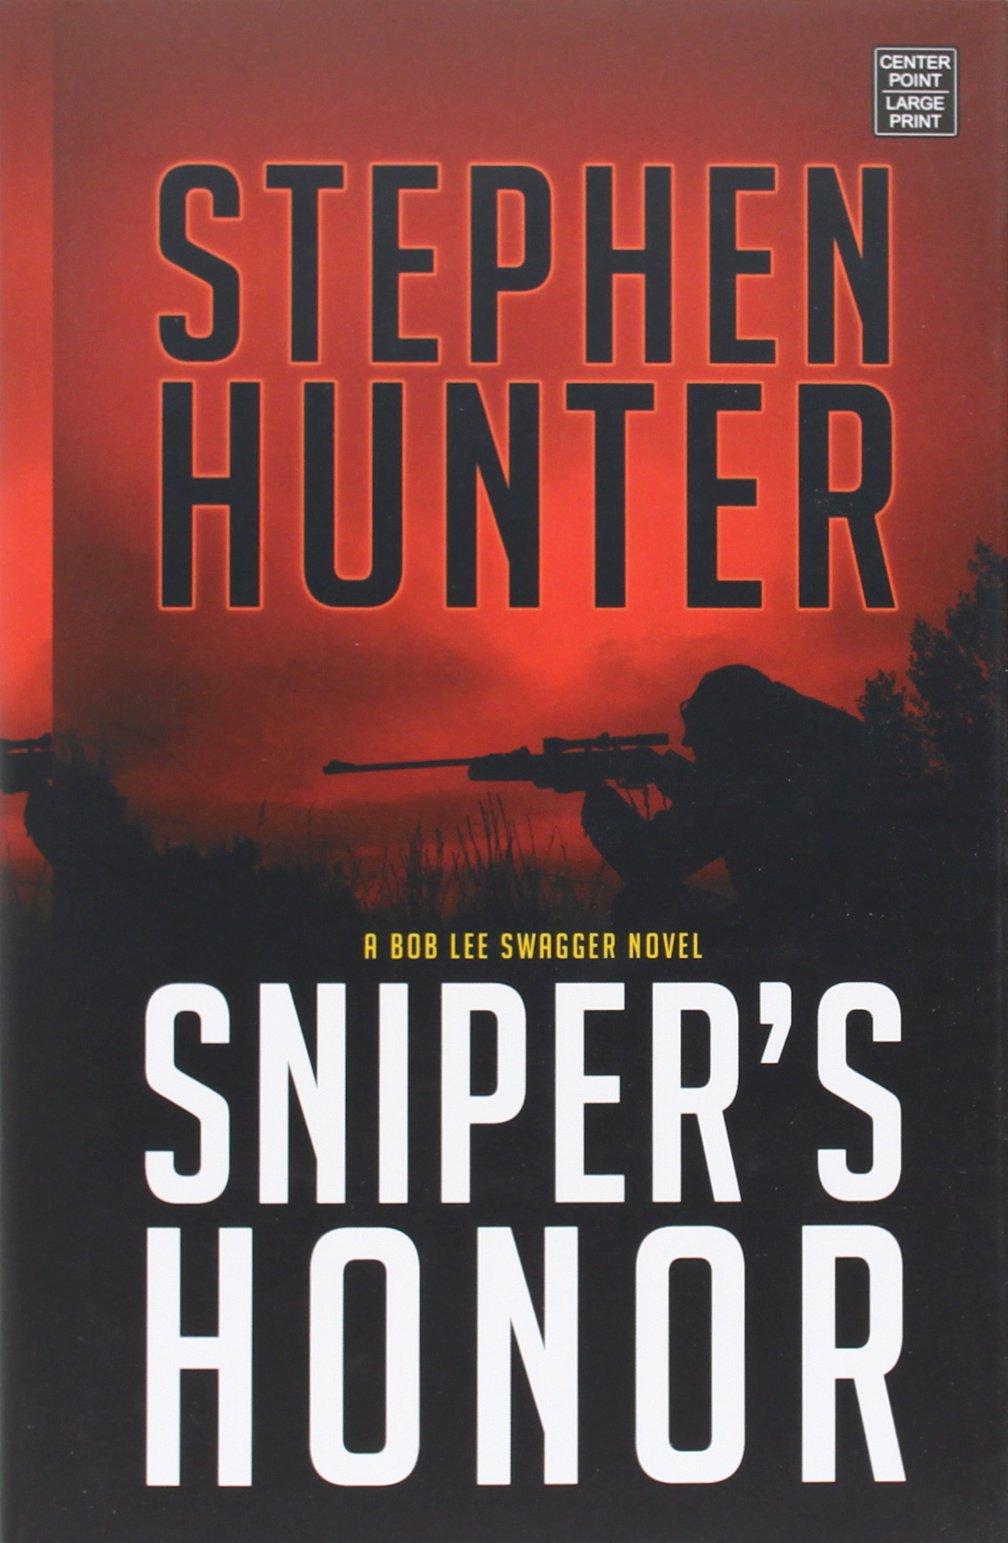 Sniper's Honor (Bob Lee Swagger): Amazon.co.uk: Stephen Hunter:  9781628991345: Books